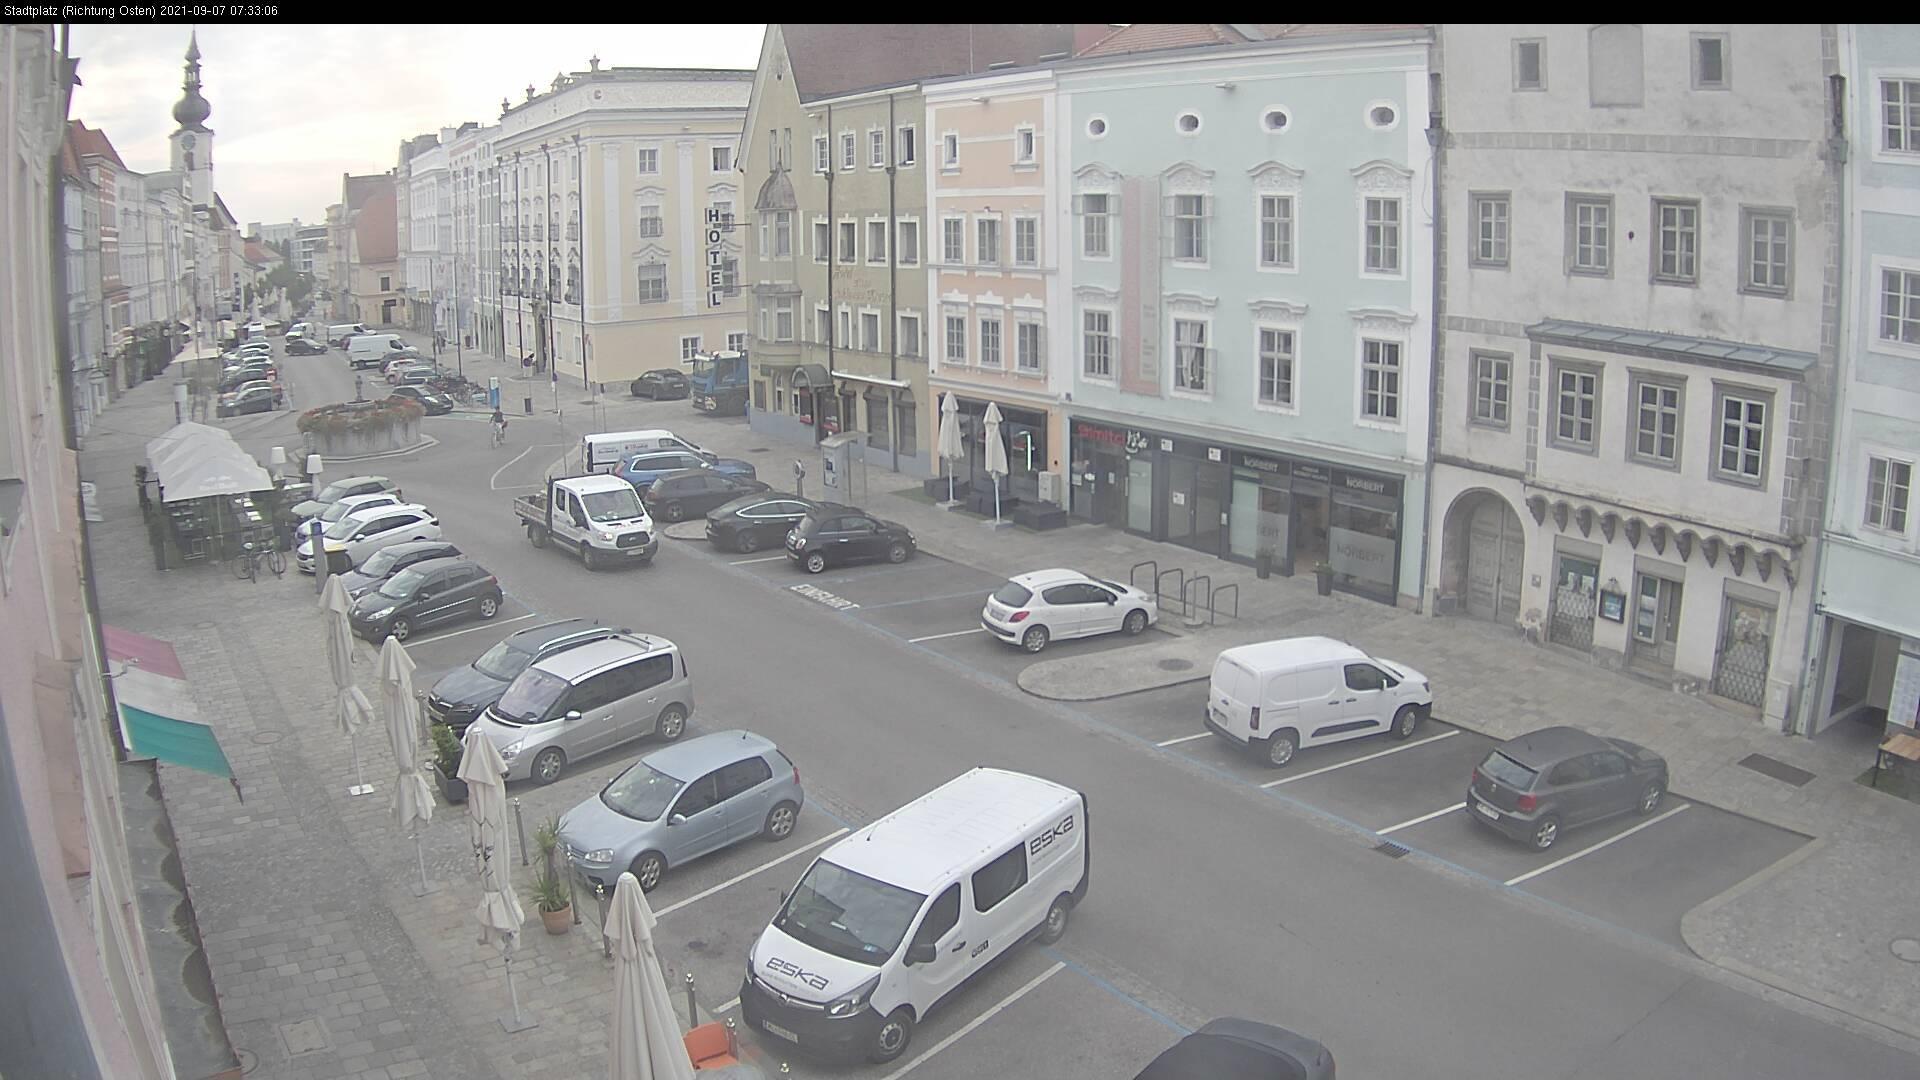 Webkamera Pernau: Wels − Kaiser-Josef-Platz